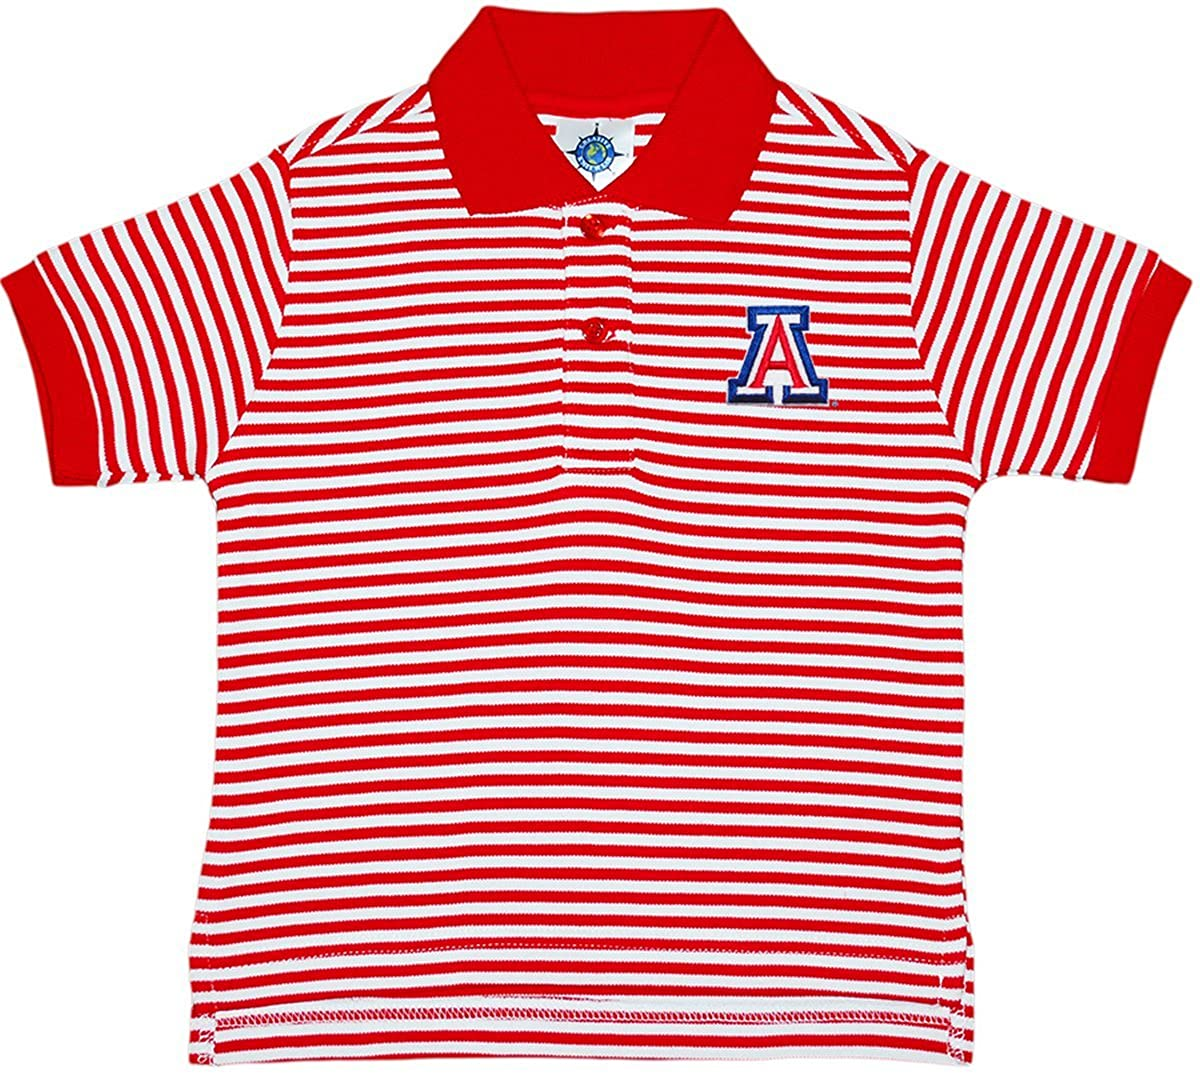 Creative Knitwear University of Arizona Wildcats Striped Polo Shirt